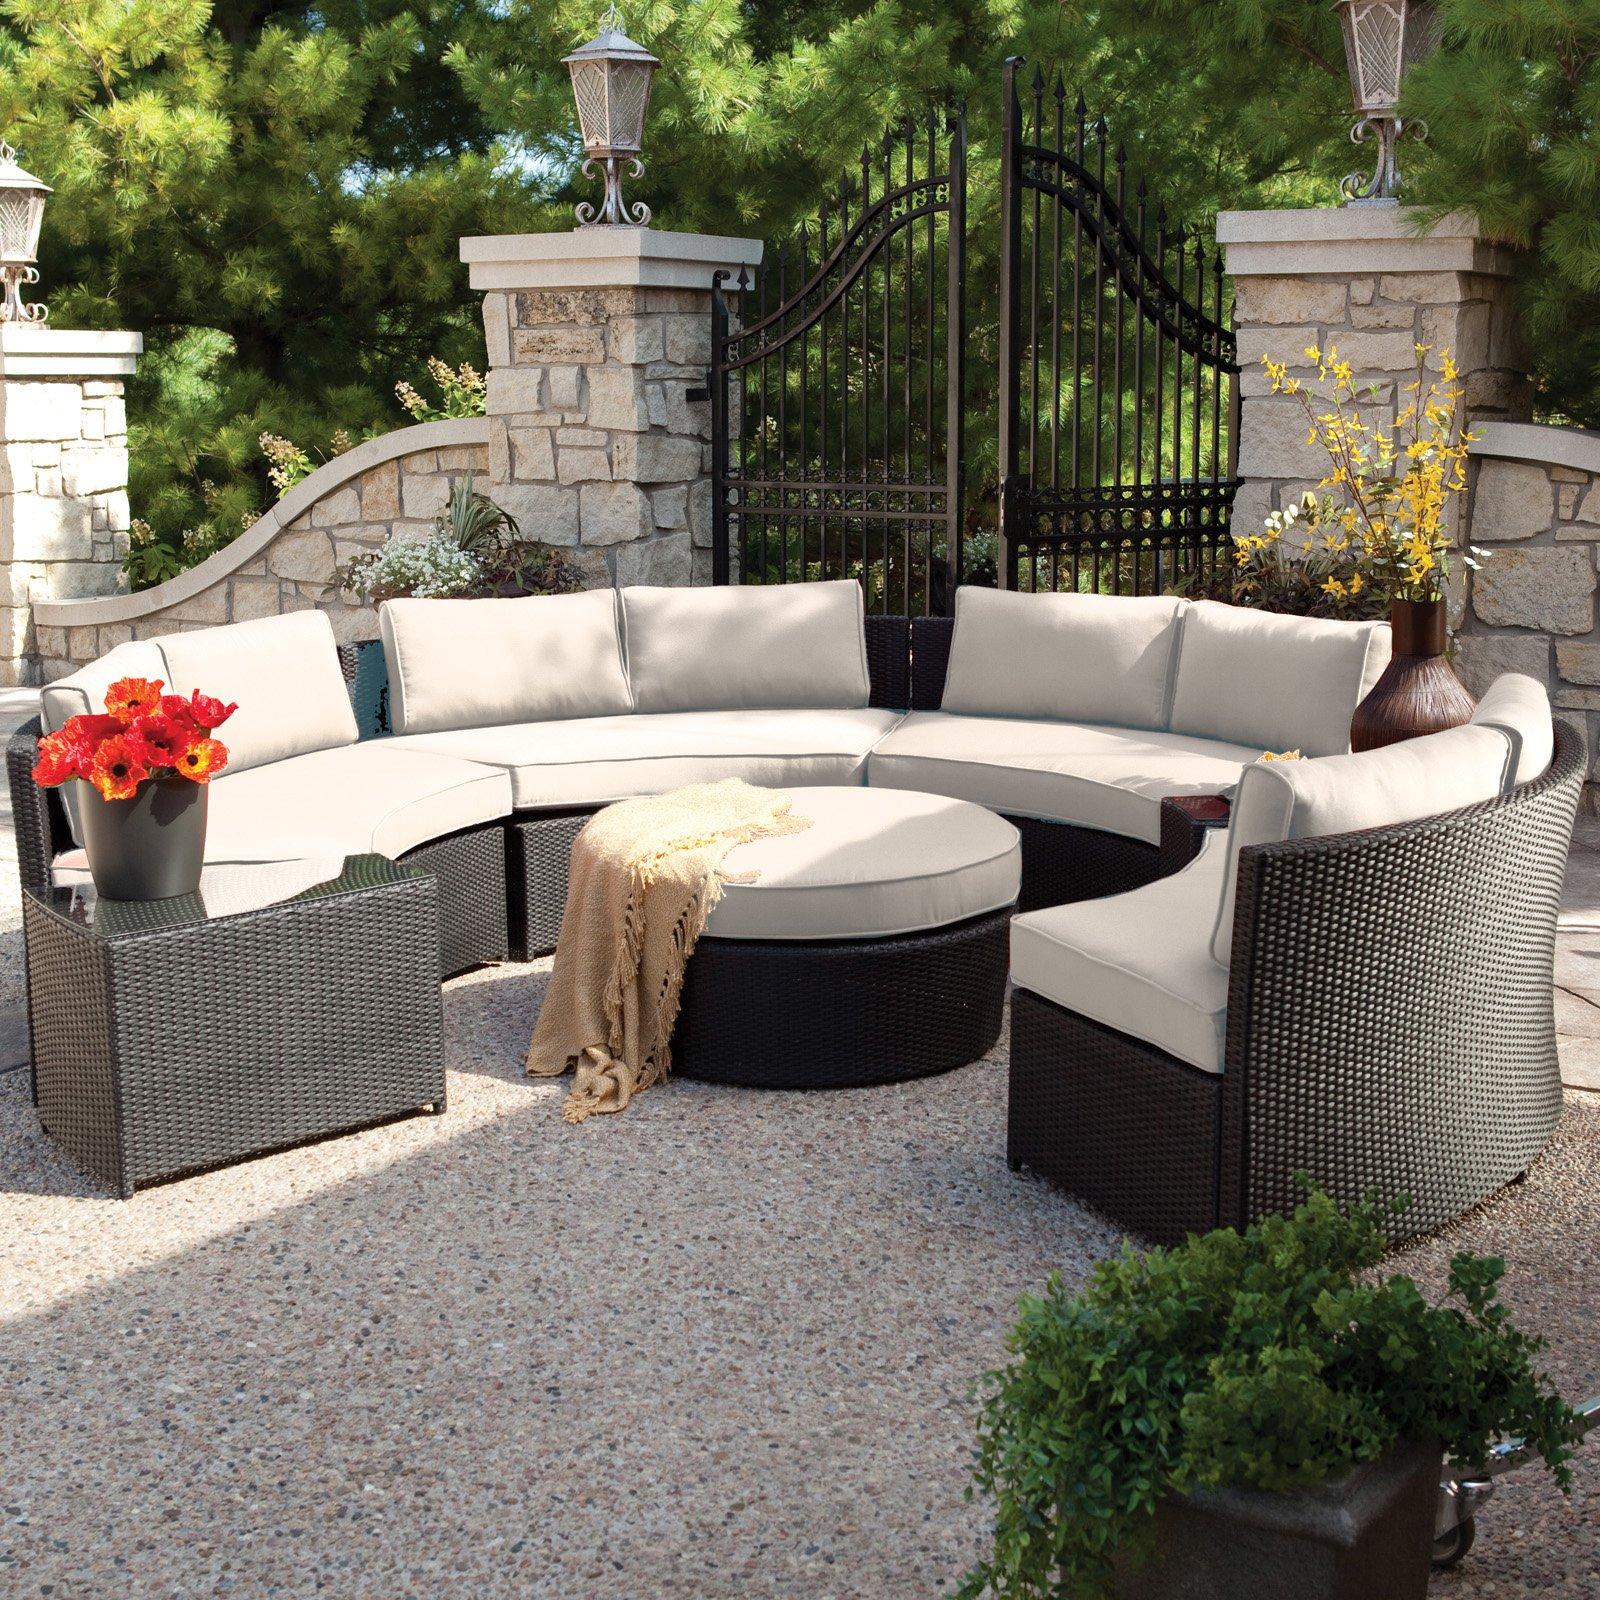 outdoor patio furniture sets belham living meridian round outdoor wicker patio furniture set with  sunbrella ZLZTLJL